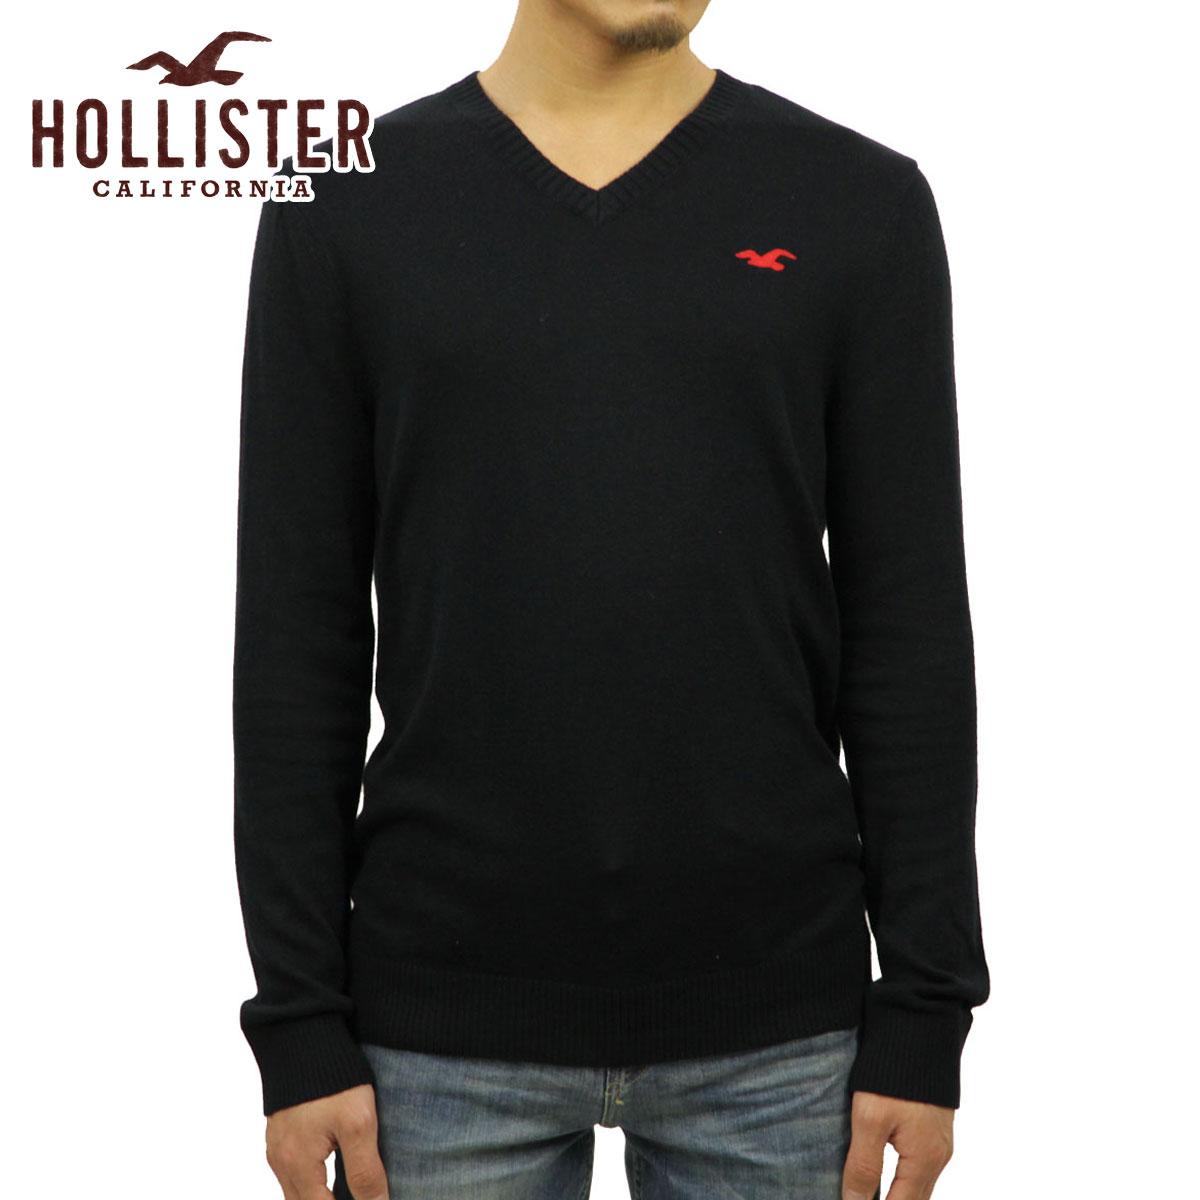 20%OFFセール 【販売期間 12/19 20:00~12/26 01:59】 ホリスター セーター メンズ 正規品 HOLLISTER Iconic V-Neck Sweater 320-201-0295-200